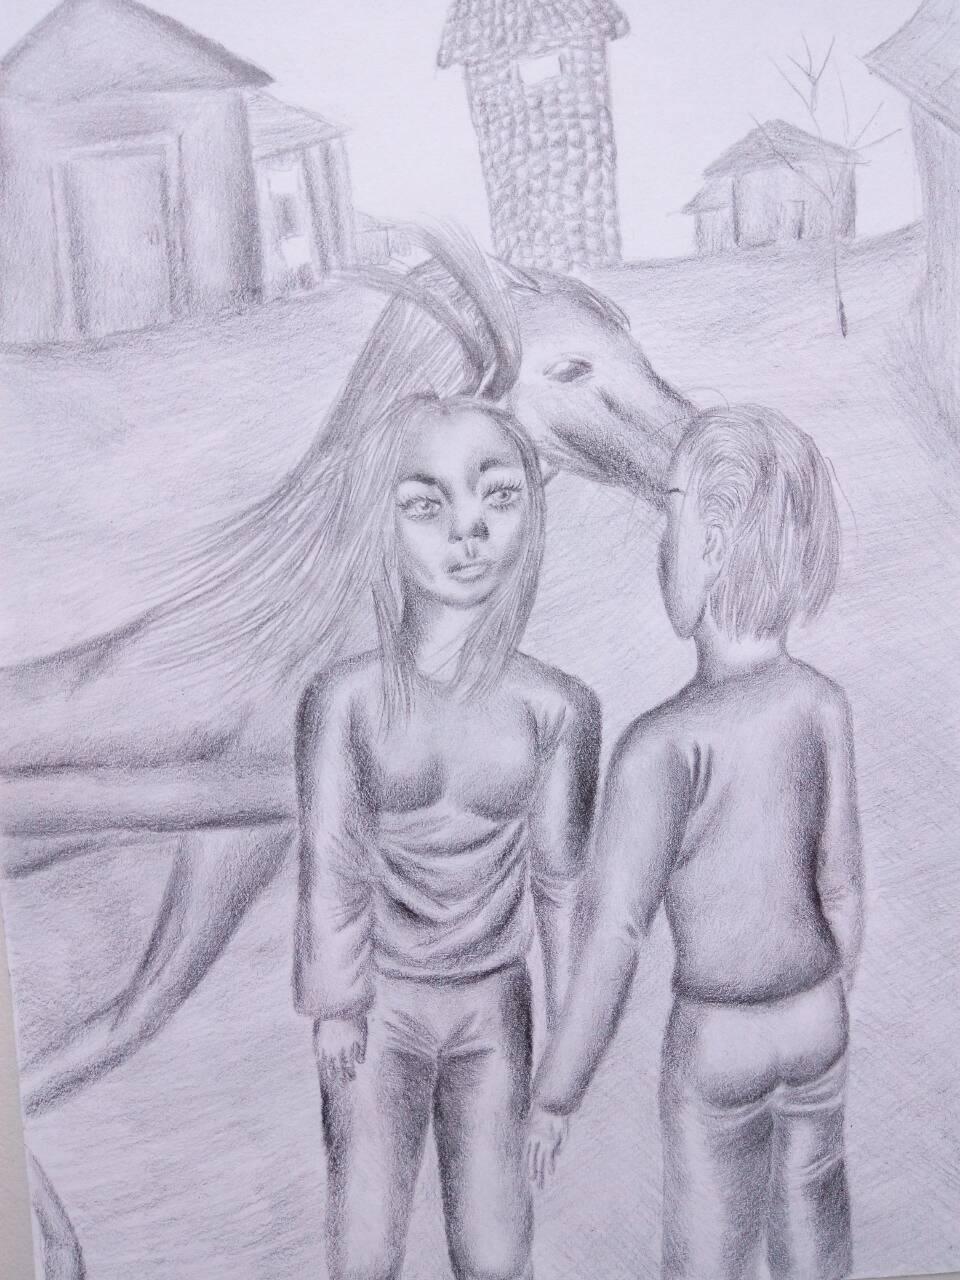 Мои рисунки ручкой и карандашом. - Страница 3 004_210